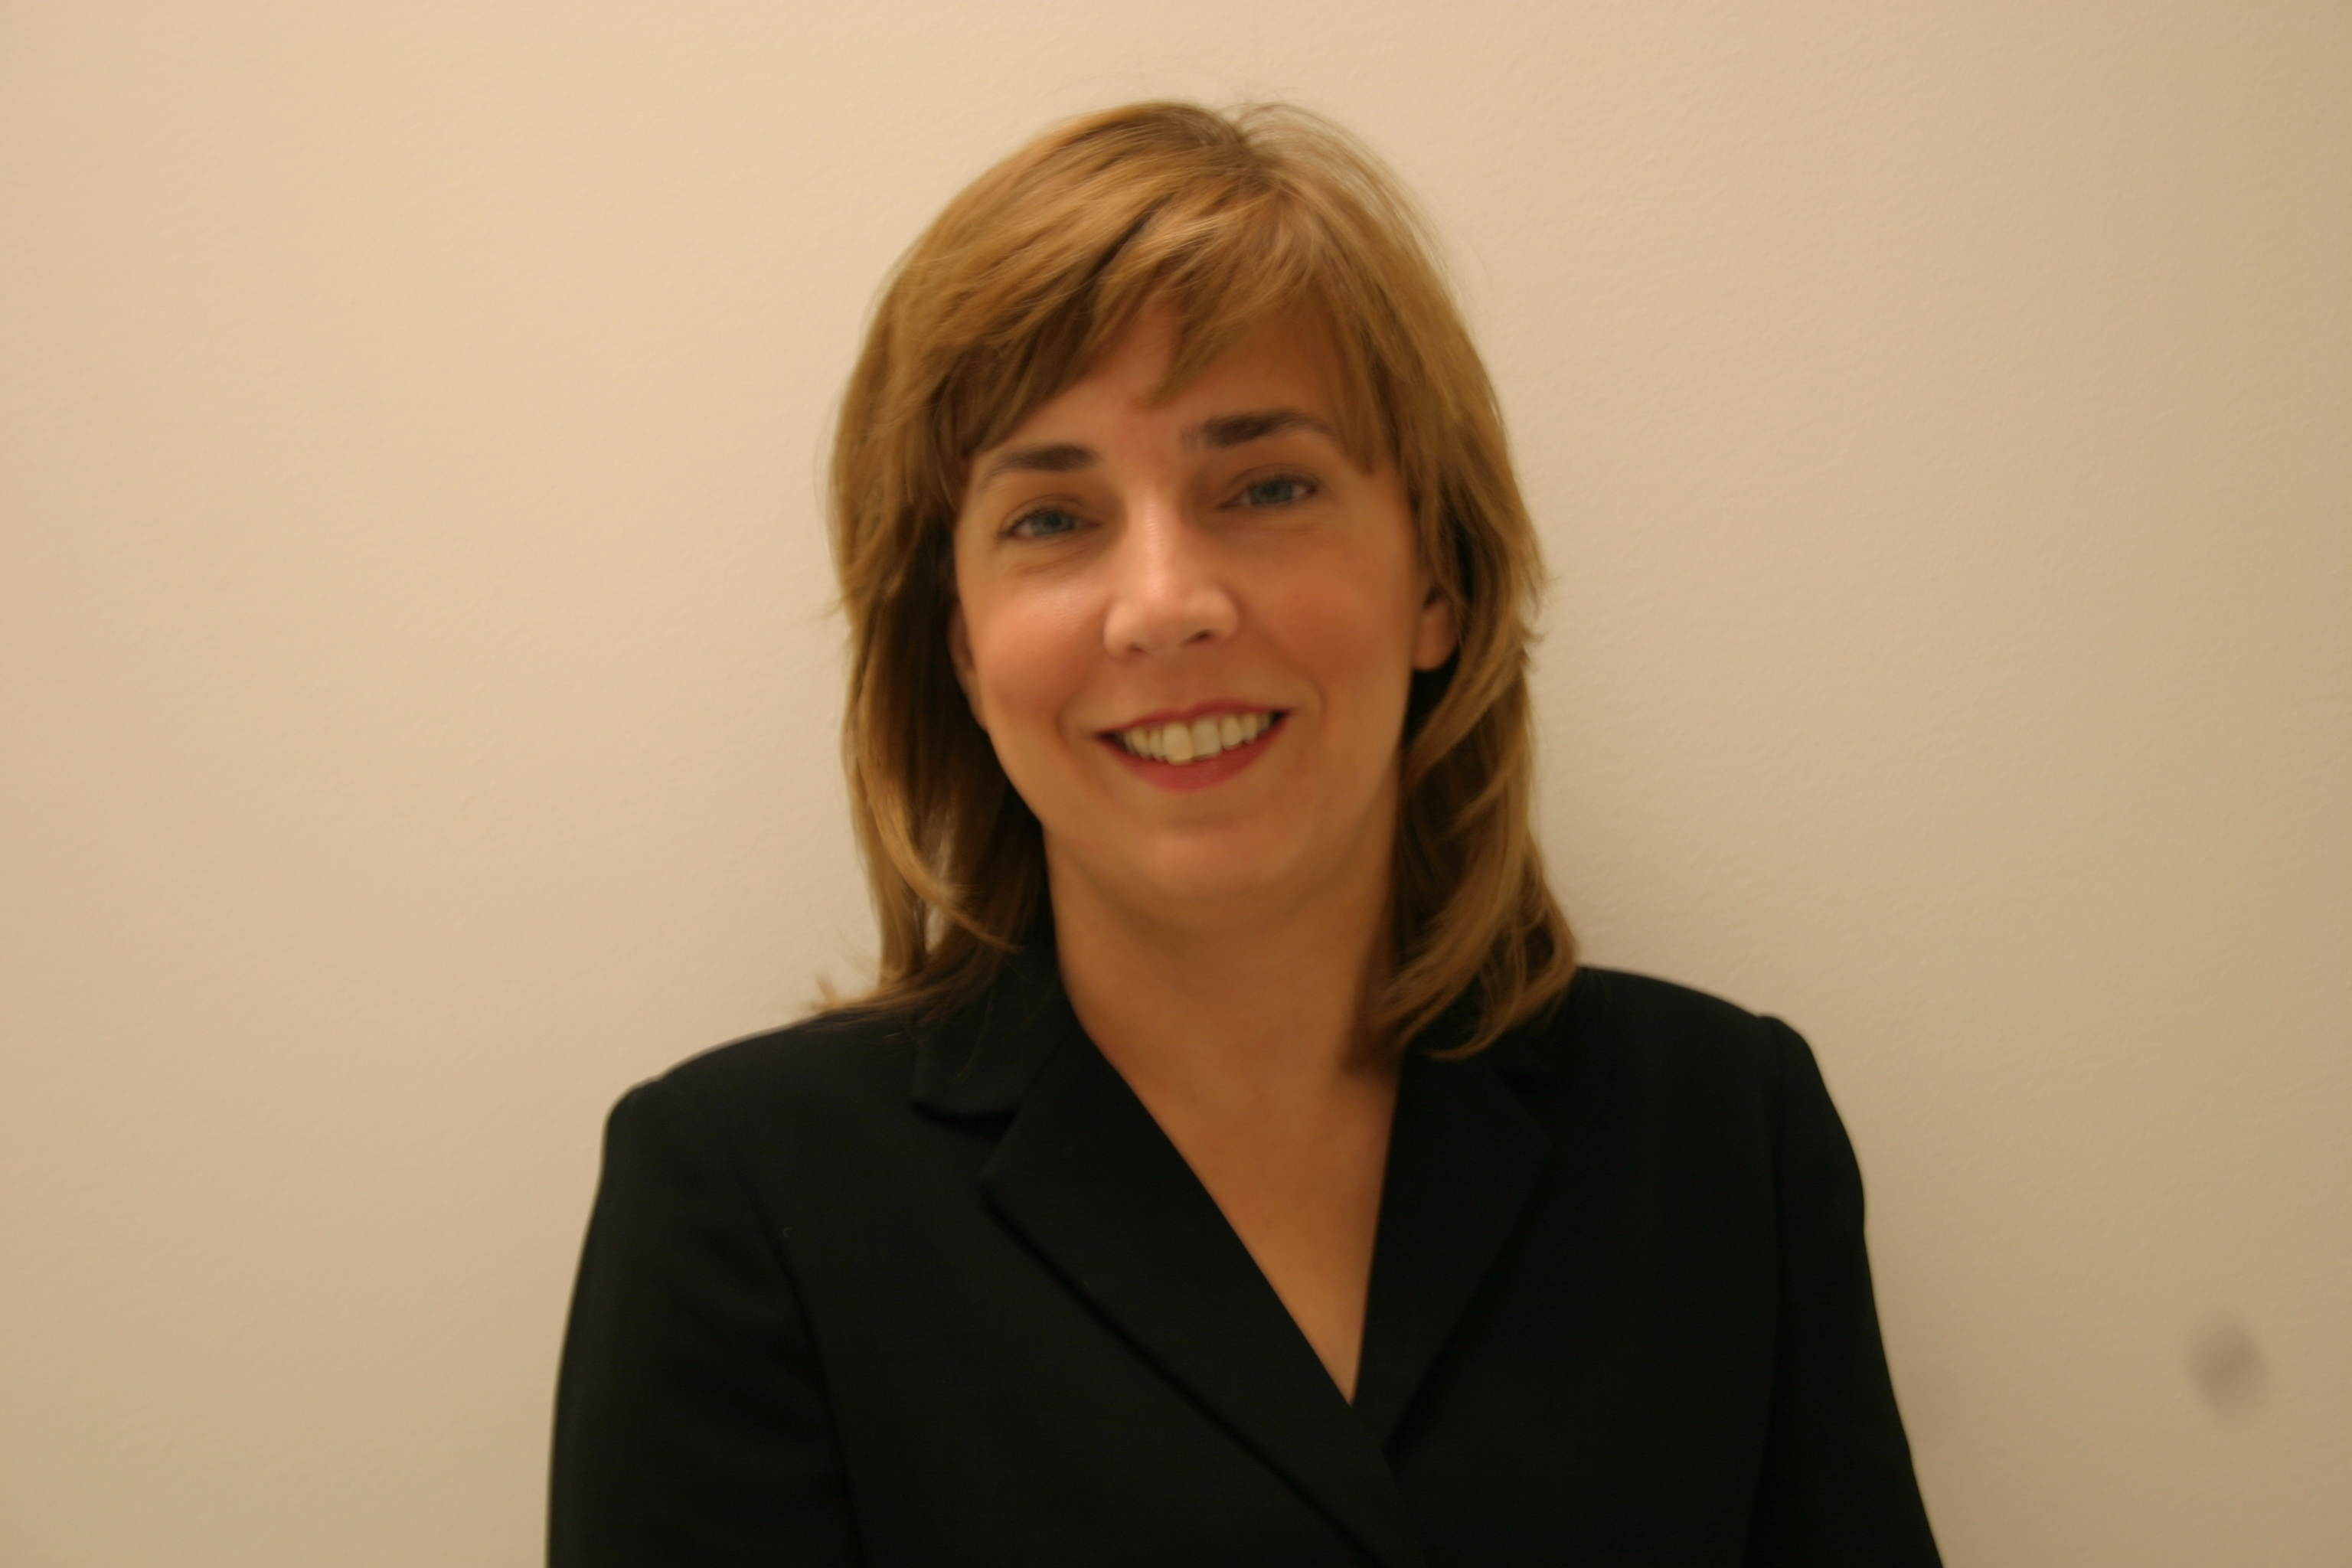 Sharon MacGregor